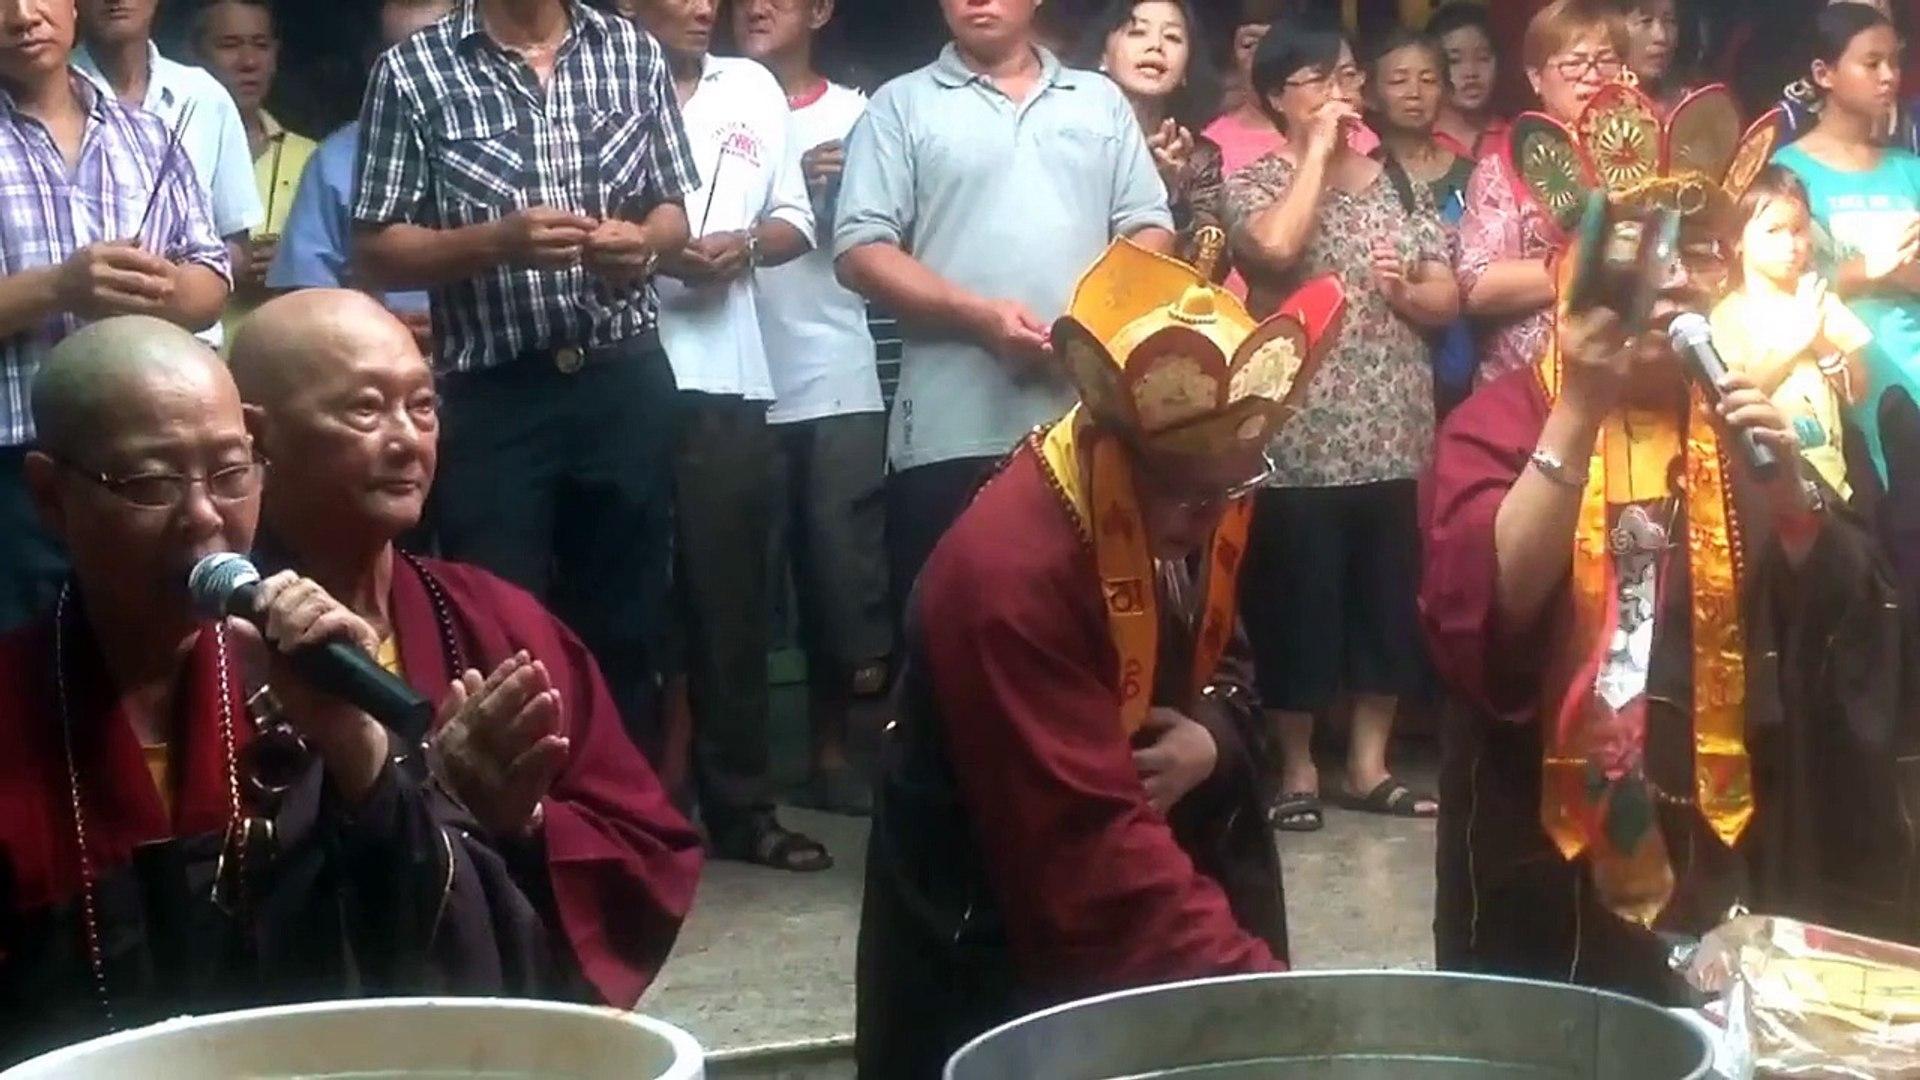 Sembahyang di Hari Akhir Kirab Budaya, Doakan Leluhur di Alam Lain